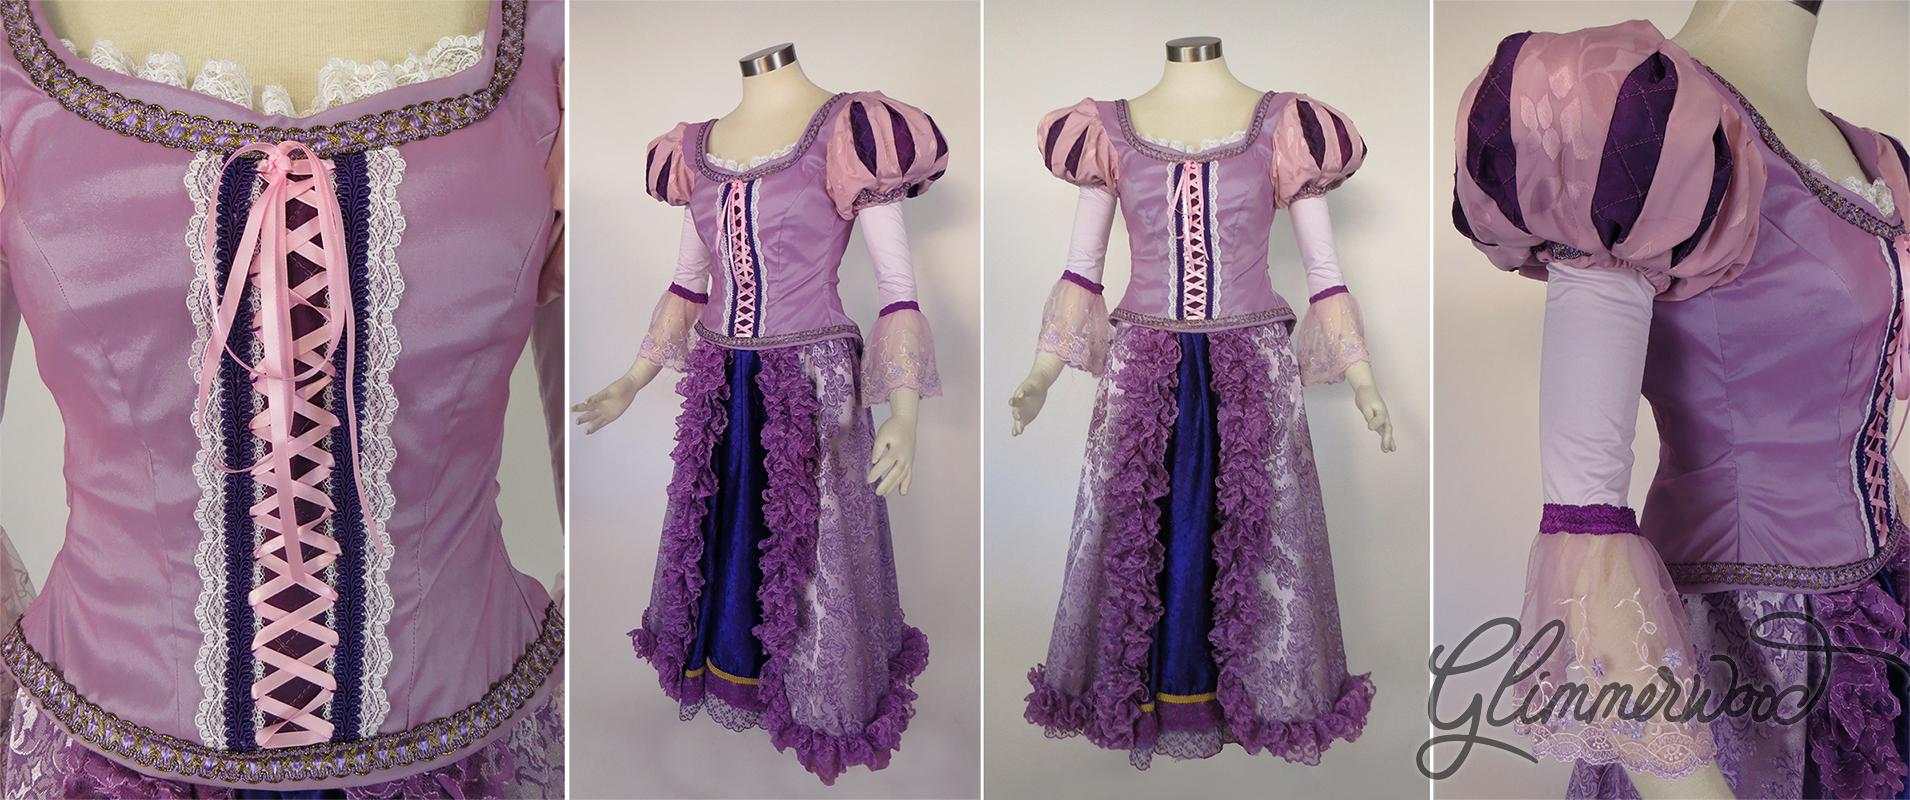 Ruffled Rapunzel